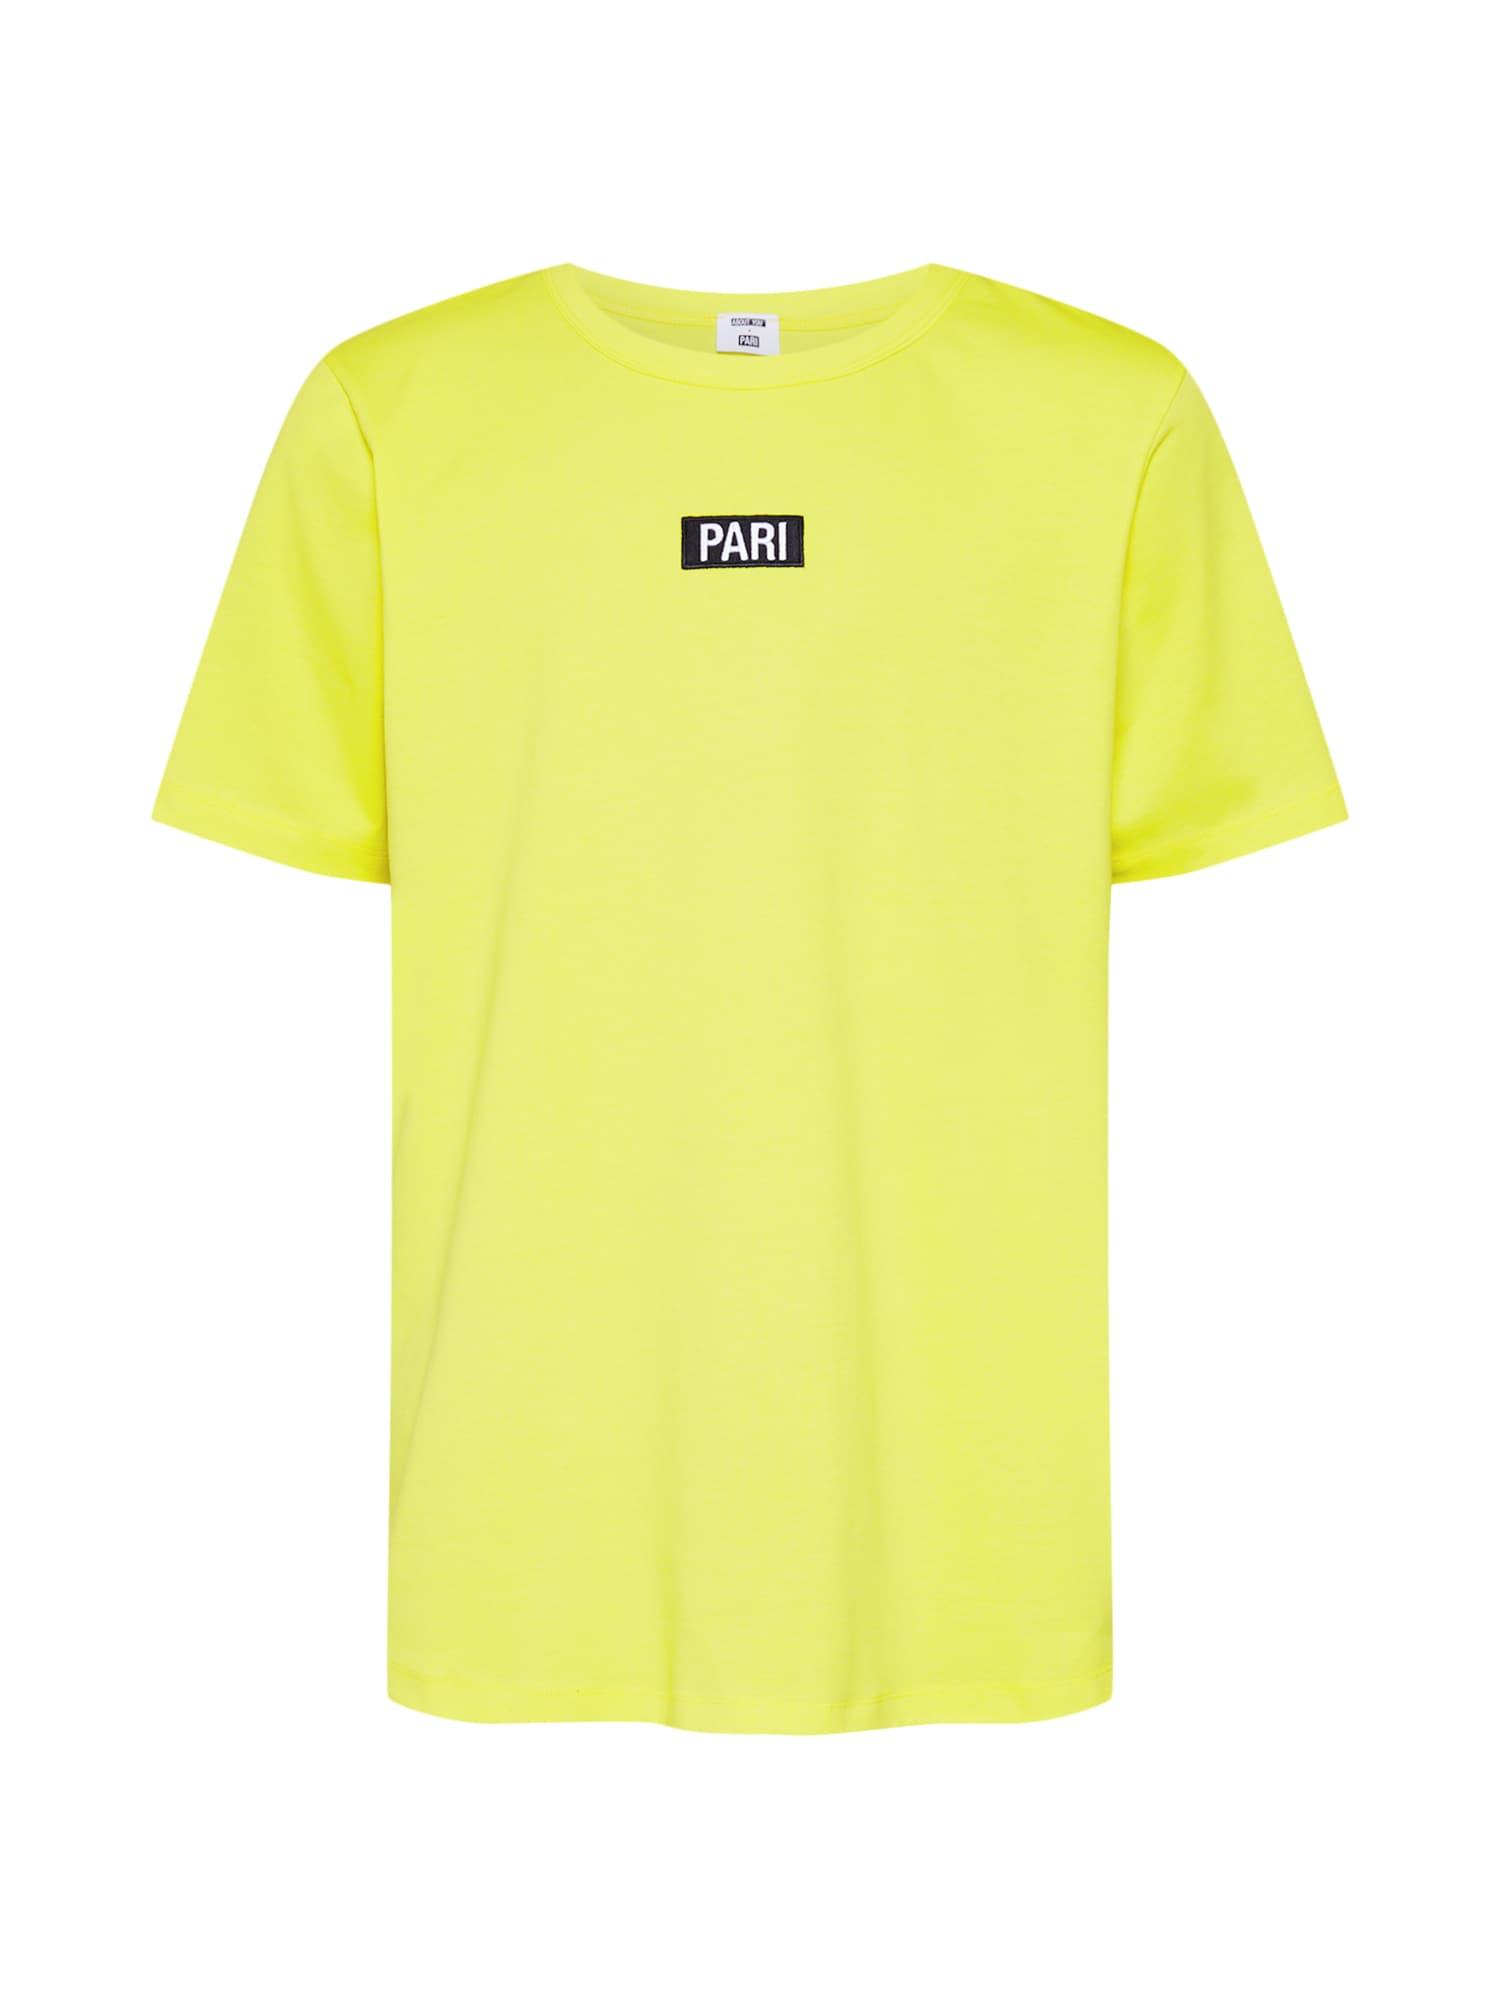 Tričko Ben žlutá černá bílá ABOUT YOU X PARI